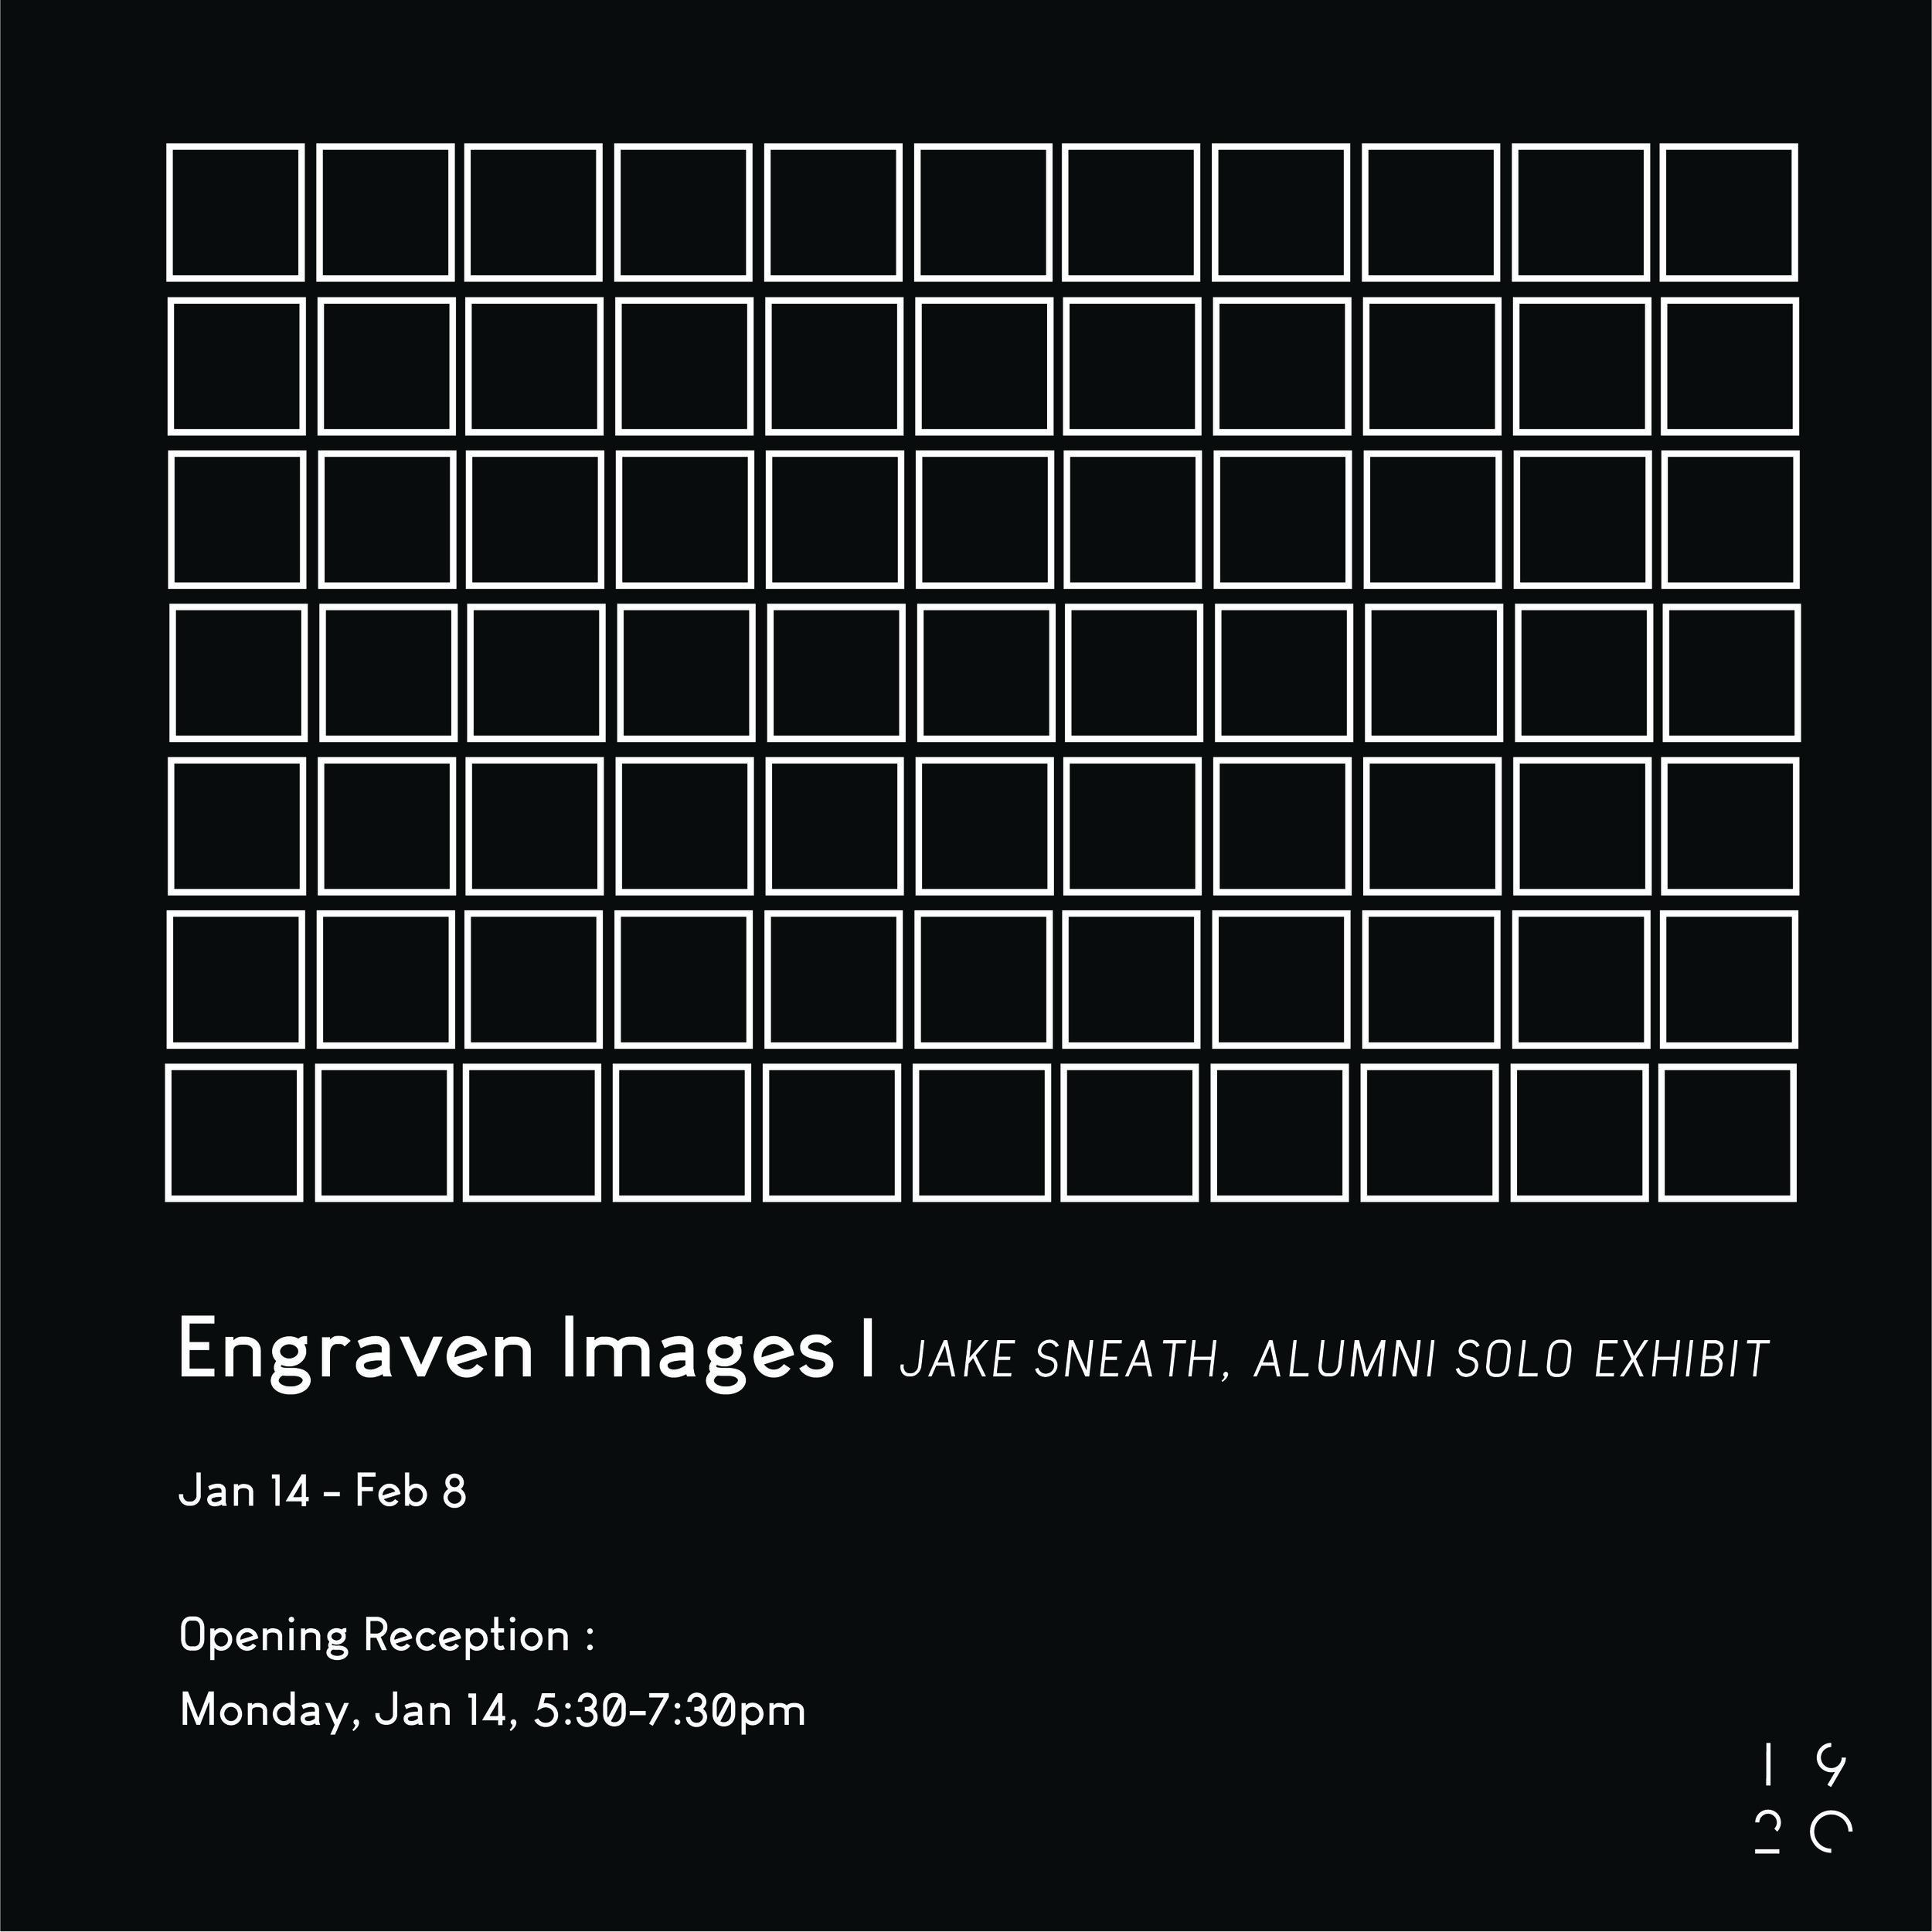 ENGRAVEN IMAGES - ALUMNI JAKE SNEATHJANUARY 14 - FEBRUARY 8